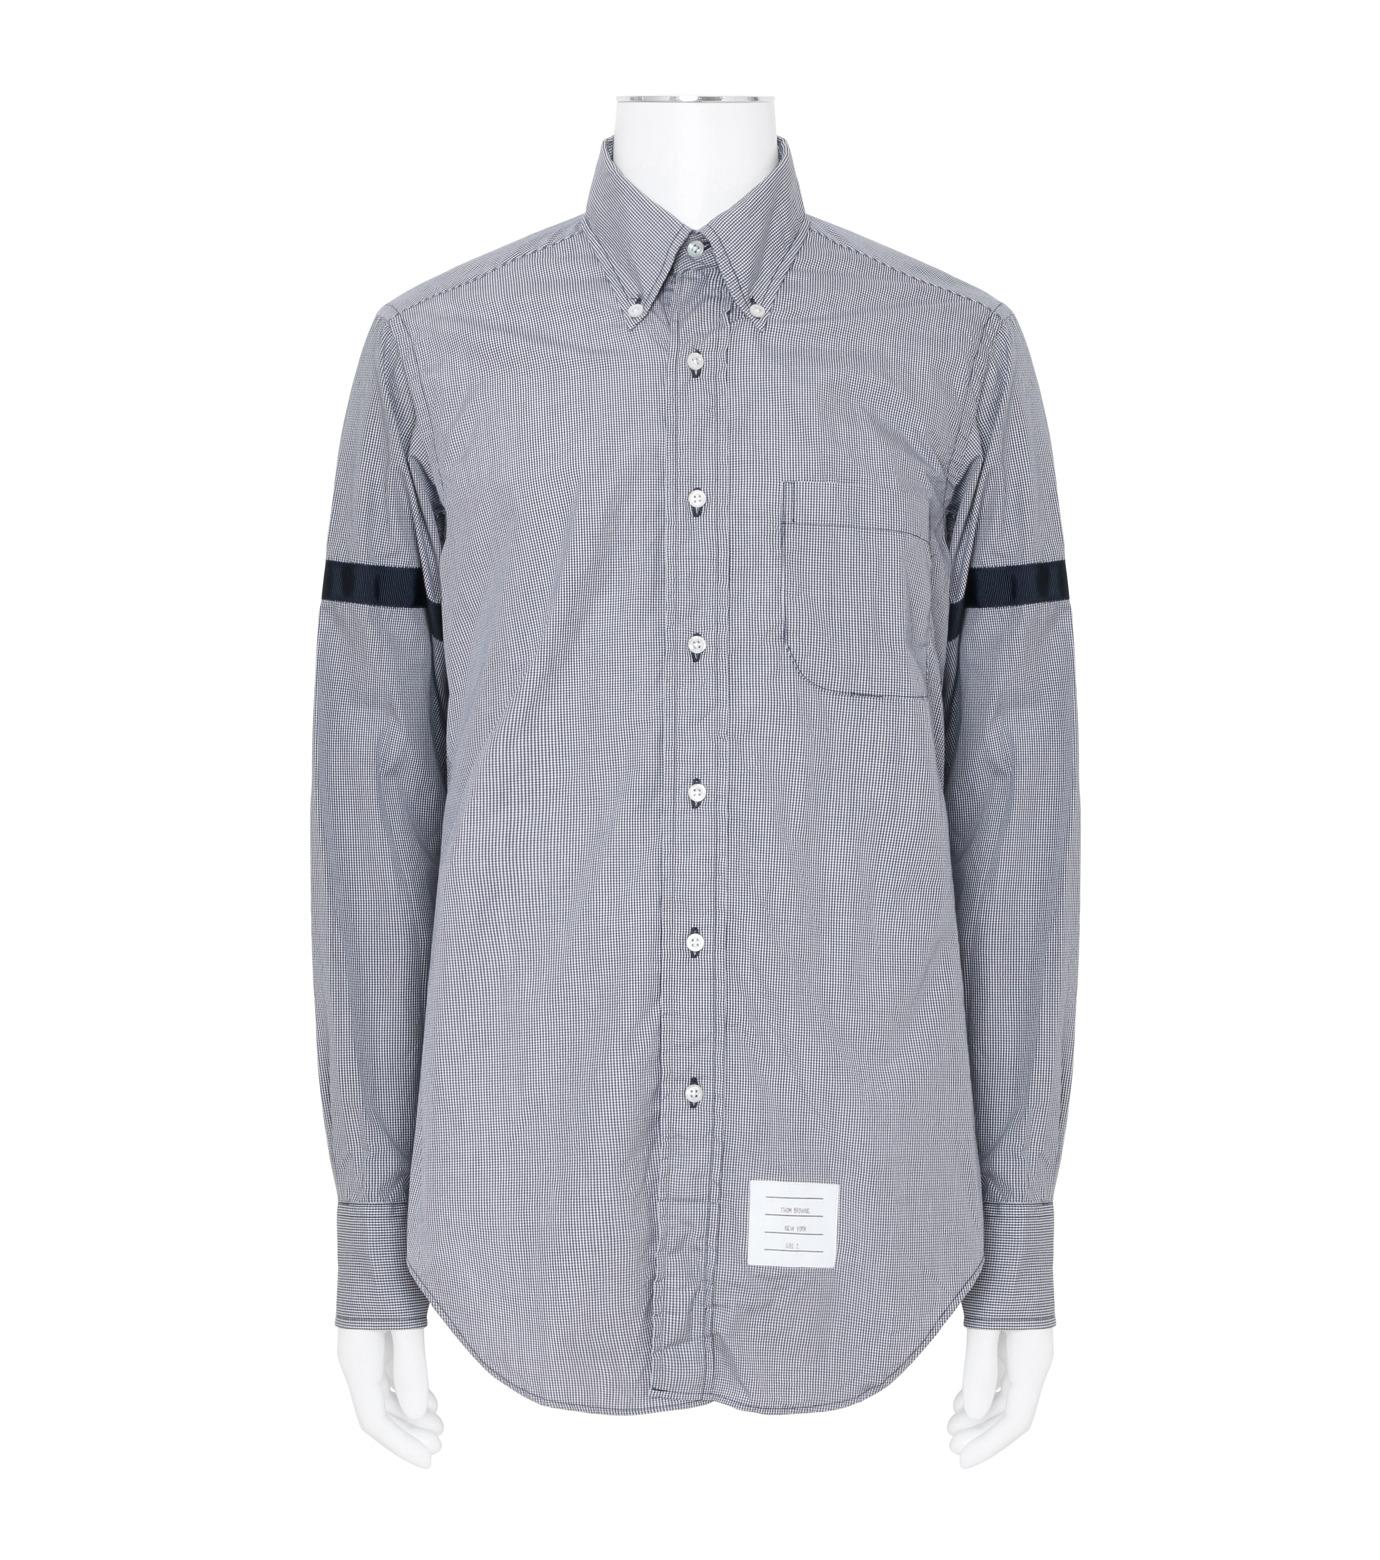 Thom Browne(トムブラウン)のArmband Check Shirt-NAVY(シャツ/shirt)-MWL150E01489-93 拡大詳細画像1